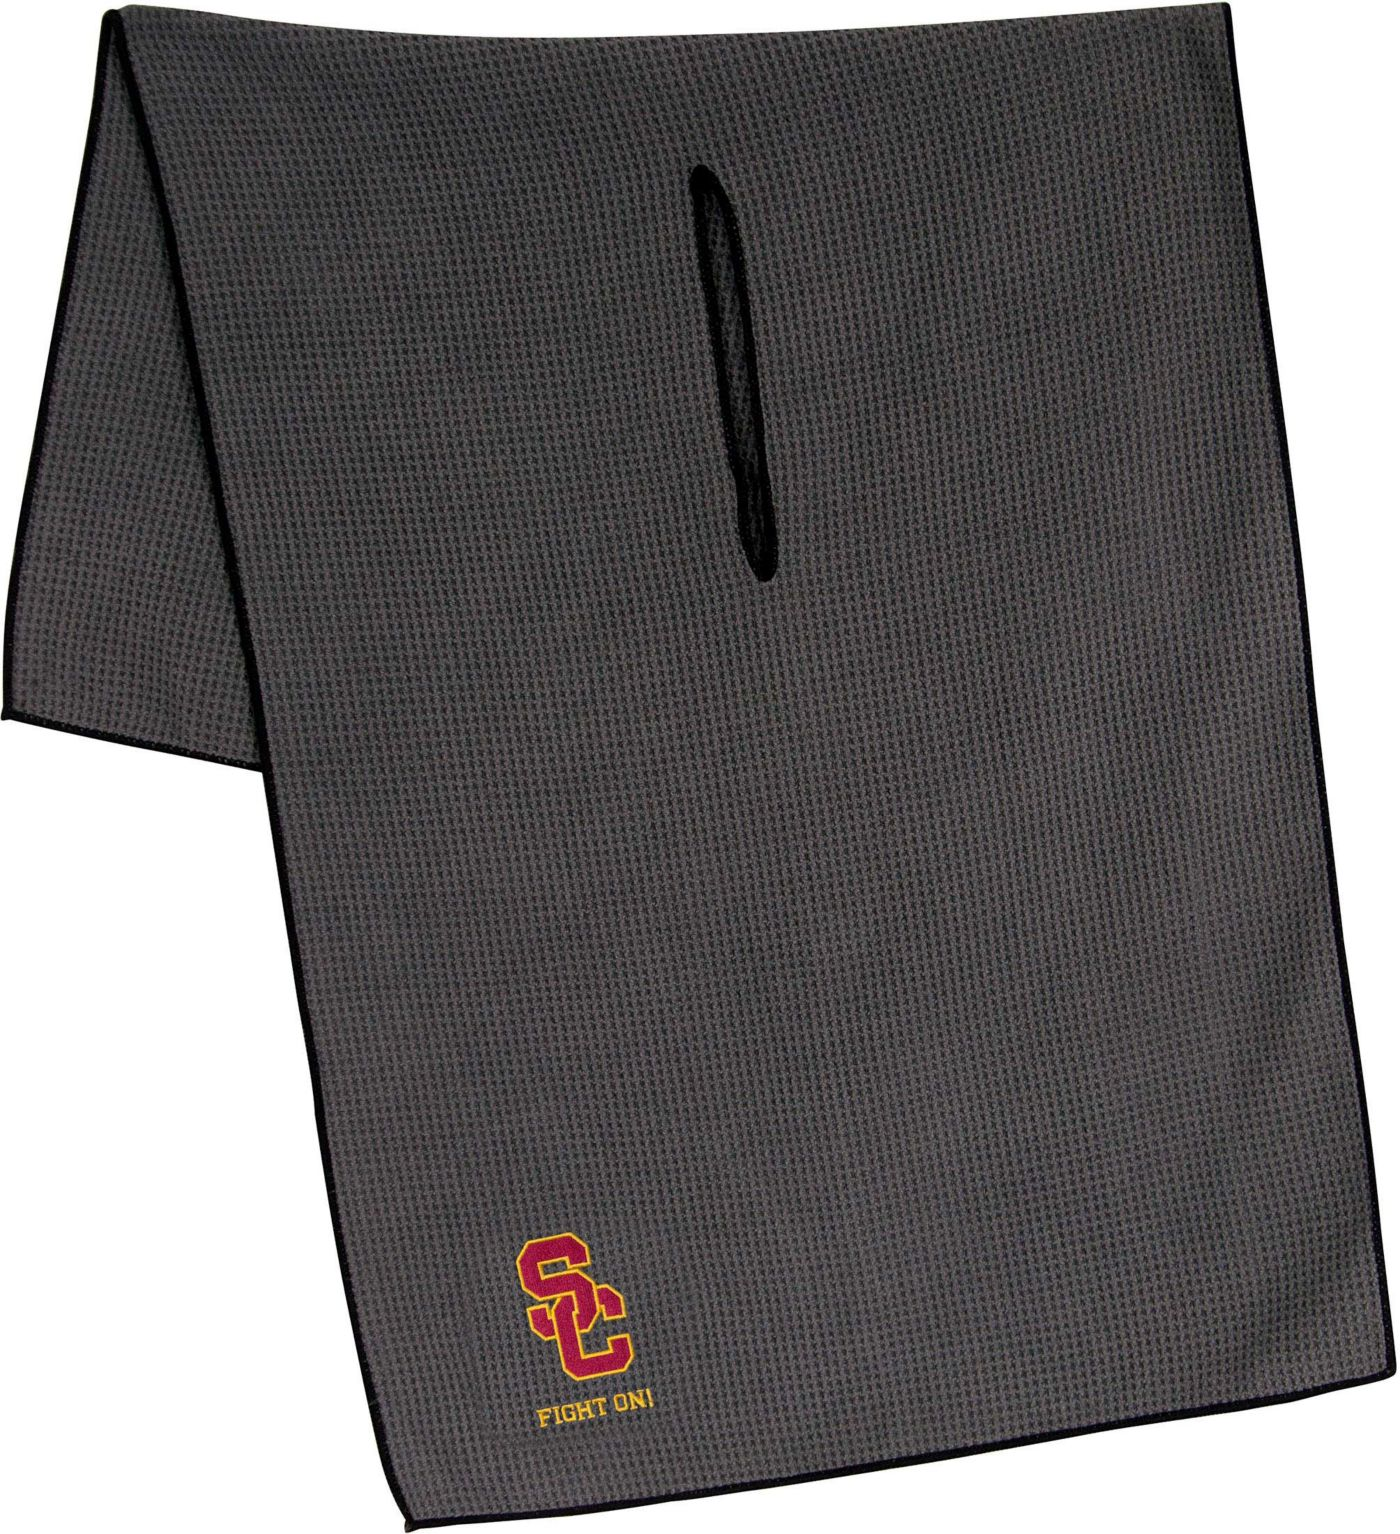 "Team Effort USC Trojans 19"" x 41"" Microfiber Golf Towel"